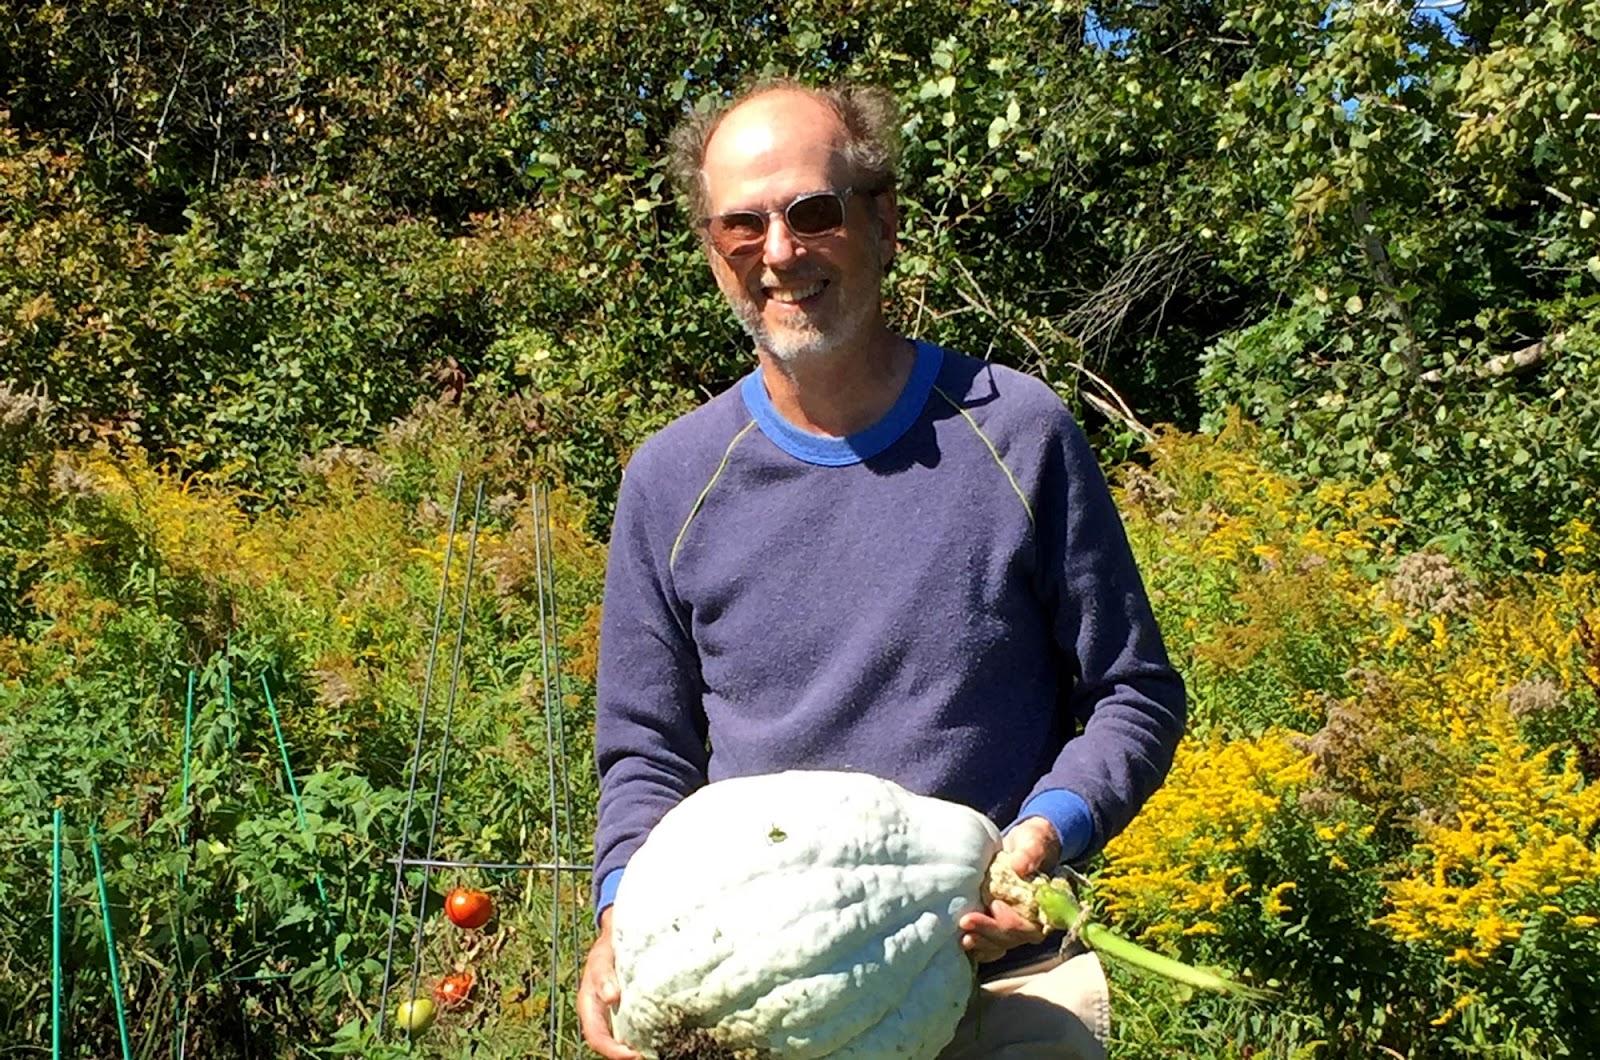 Art Baur in his vegetable garden